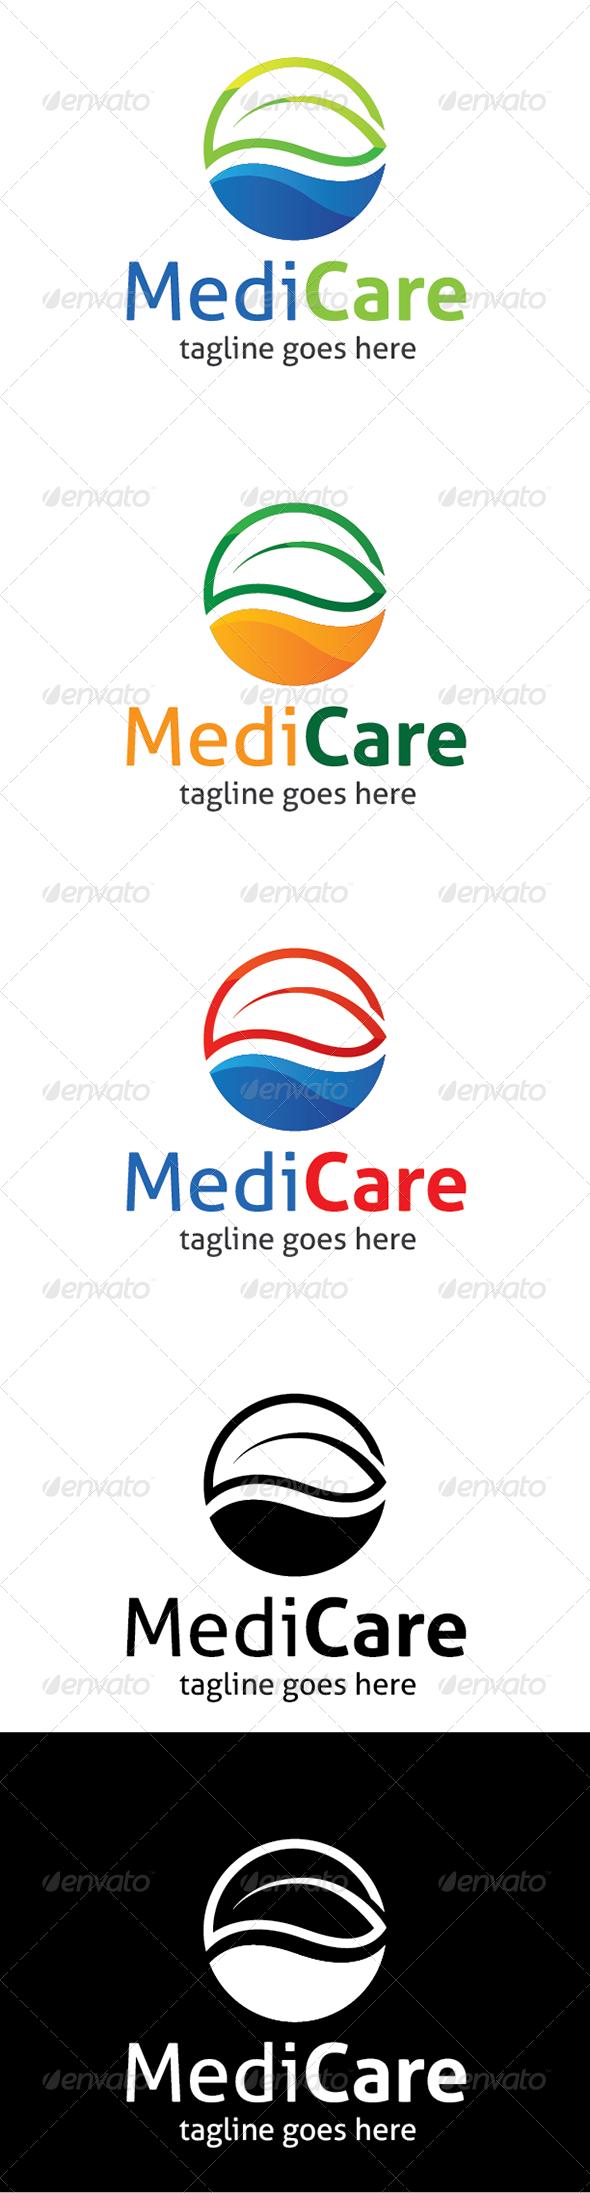 MediCare Logo - Nature Logo Templates